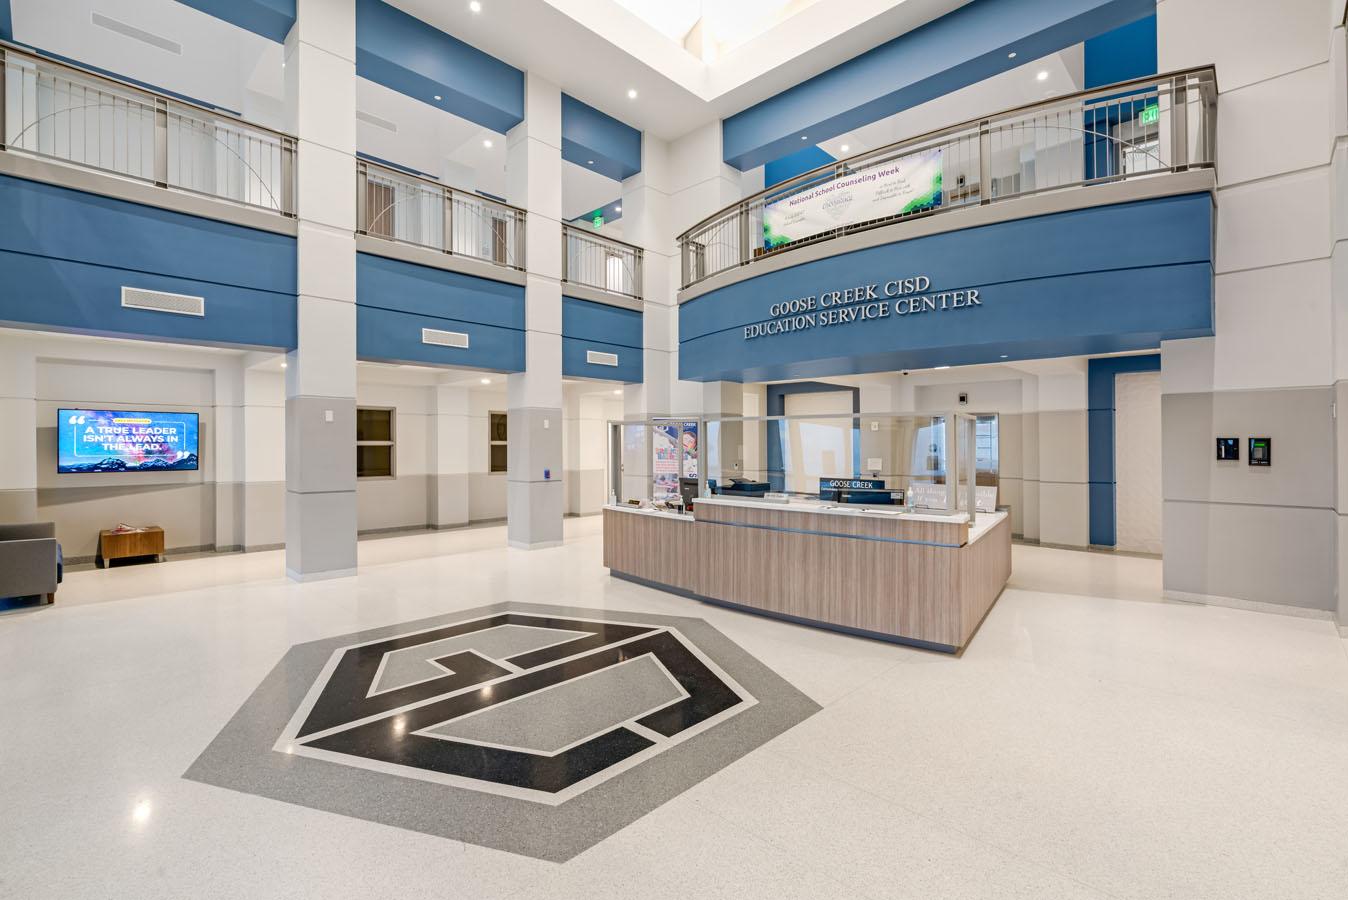 Education Service Center